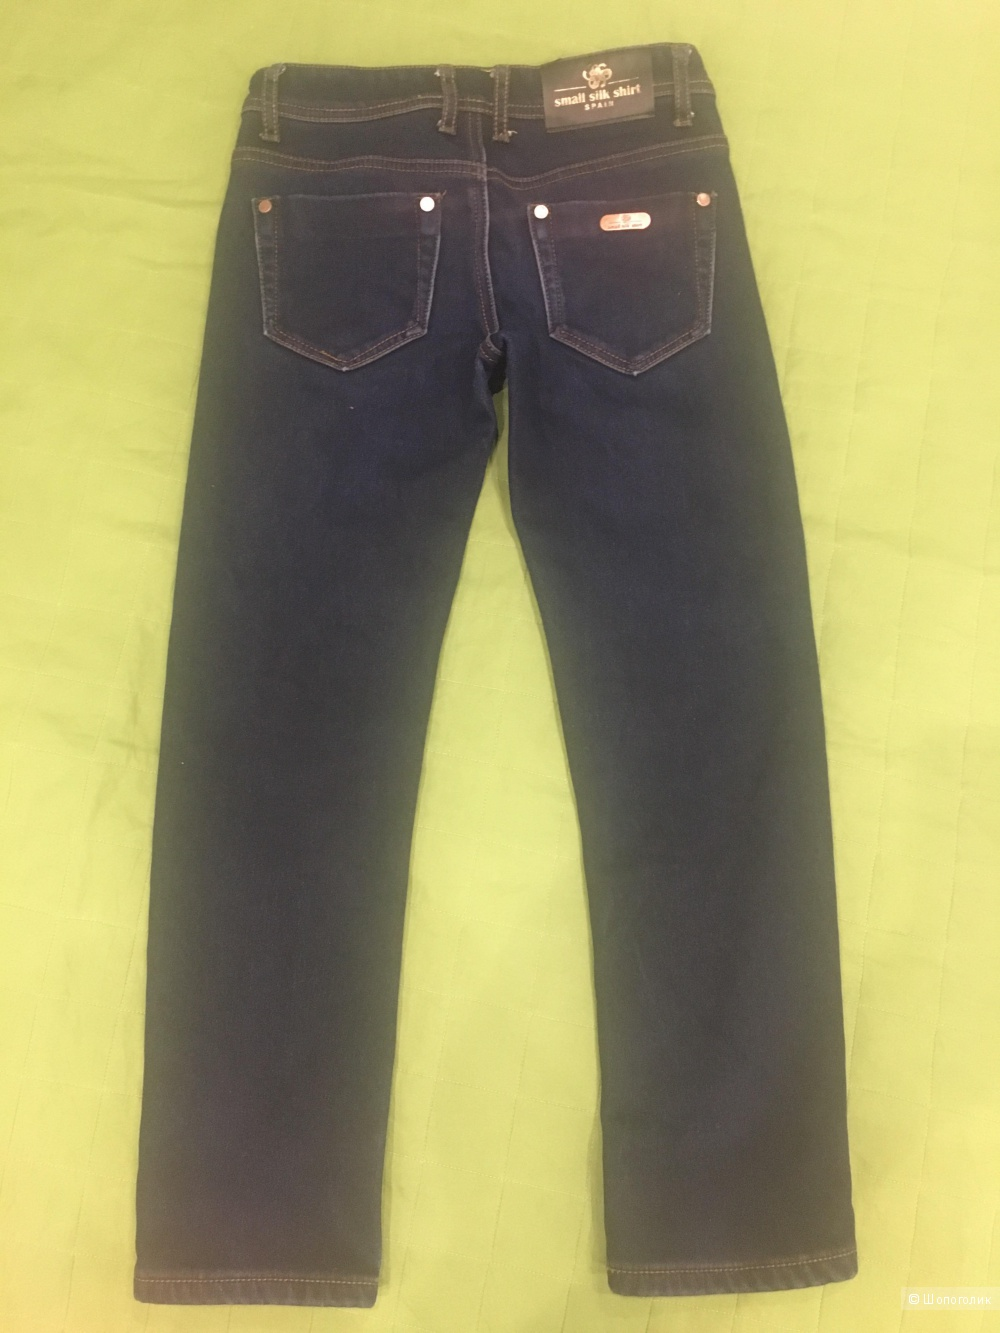 Утеплённые джинсы Small Silk Shirt,10лет.